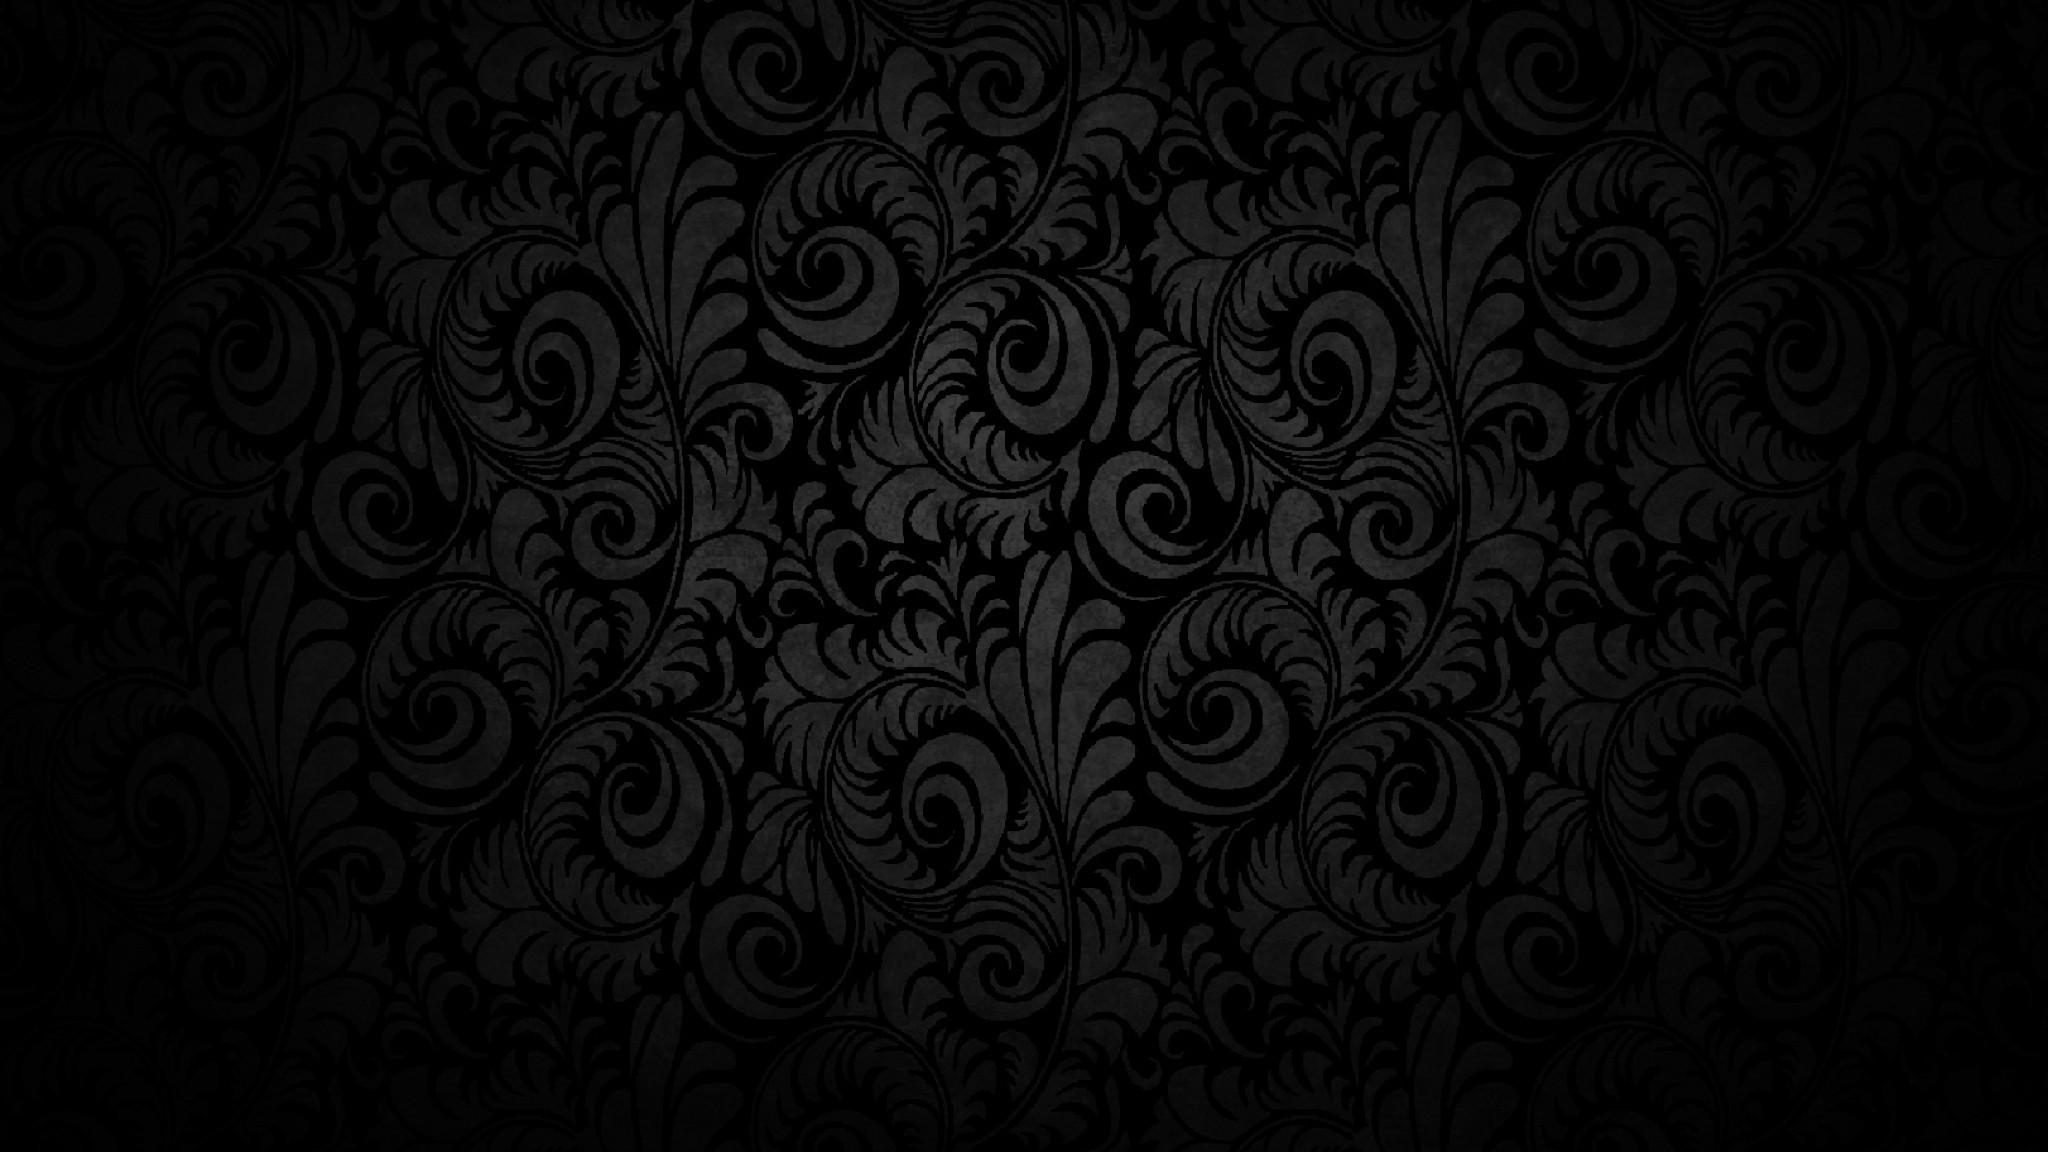 Wallpaper pattern, background, surface, wall, dark